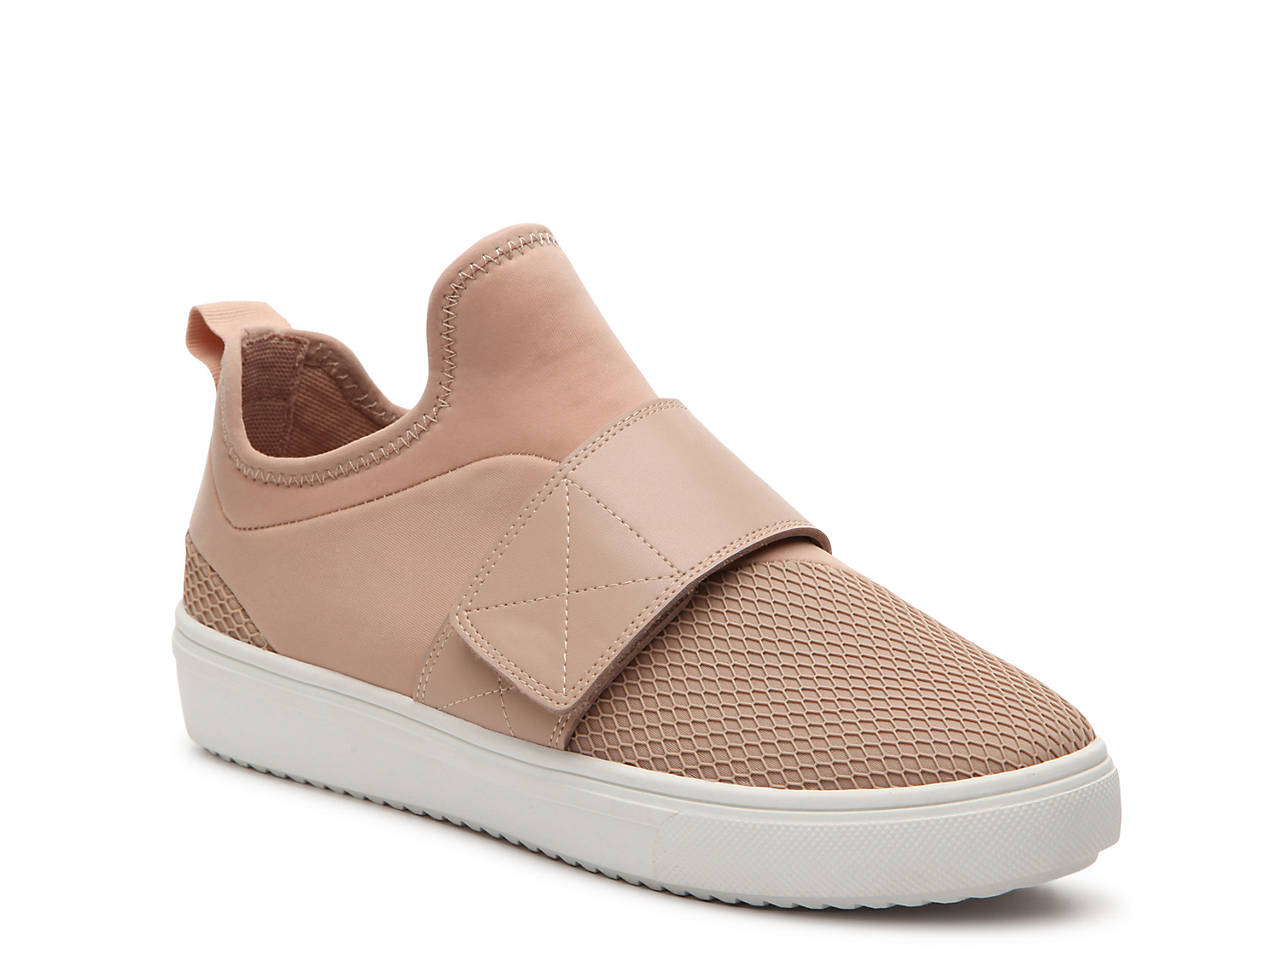 13287ccd3a6 Steve Madden Hanny Sneaker Women s Shoes